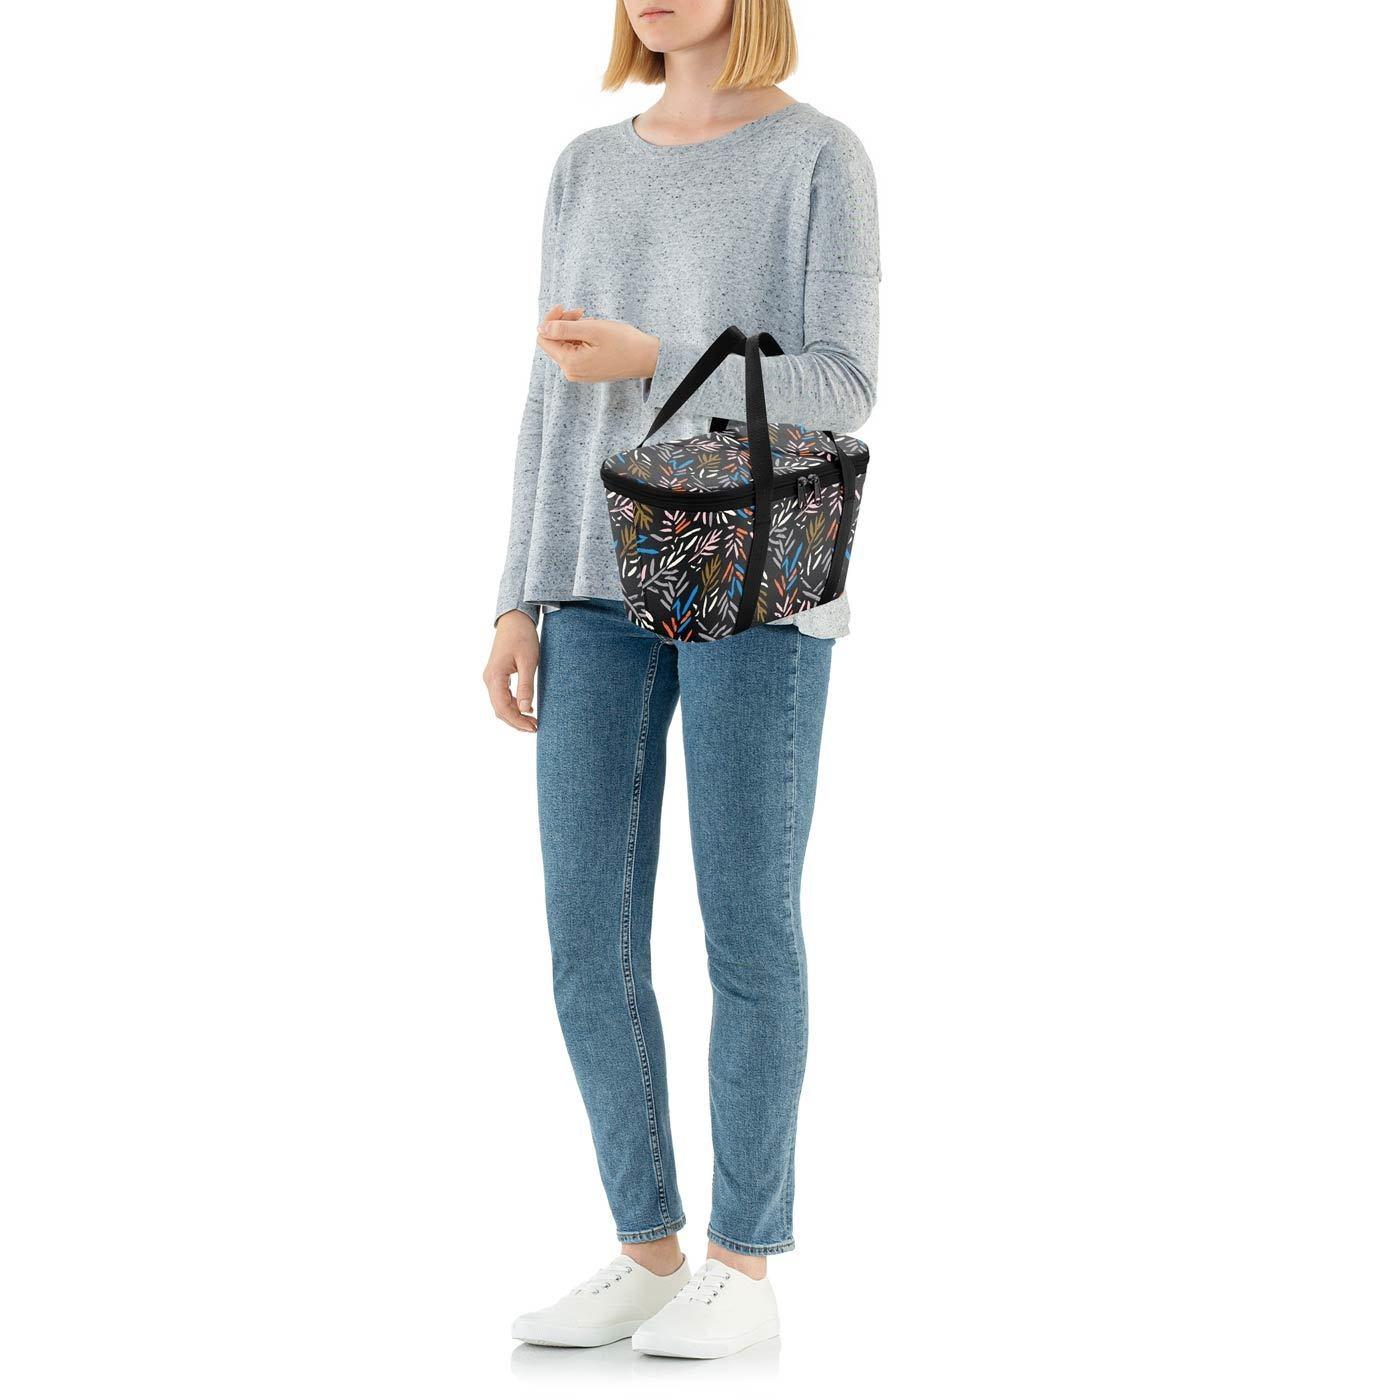 Termotaška Coolerbag XS autumn 1_1